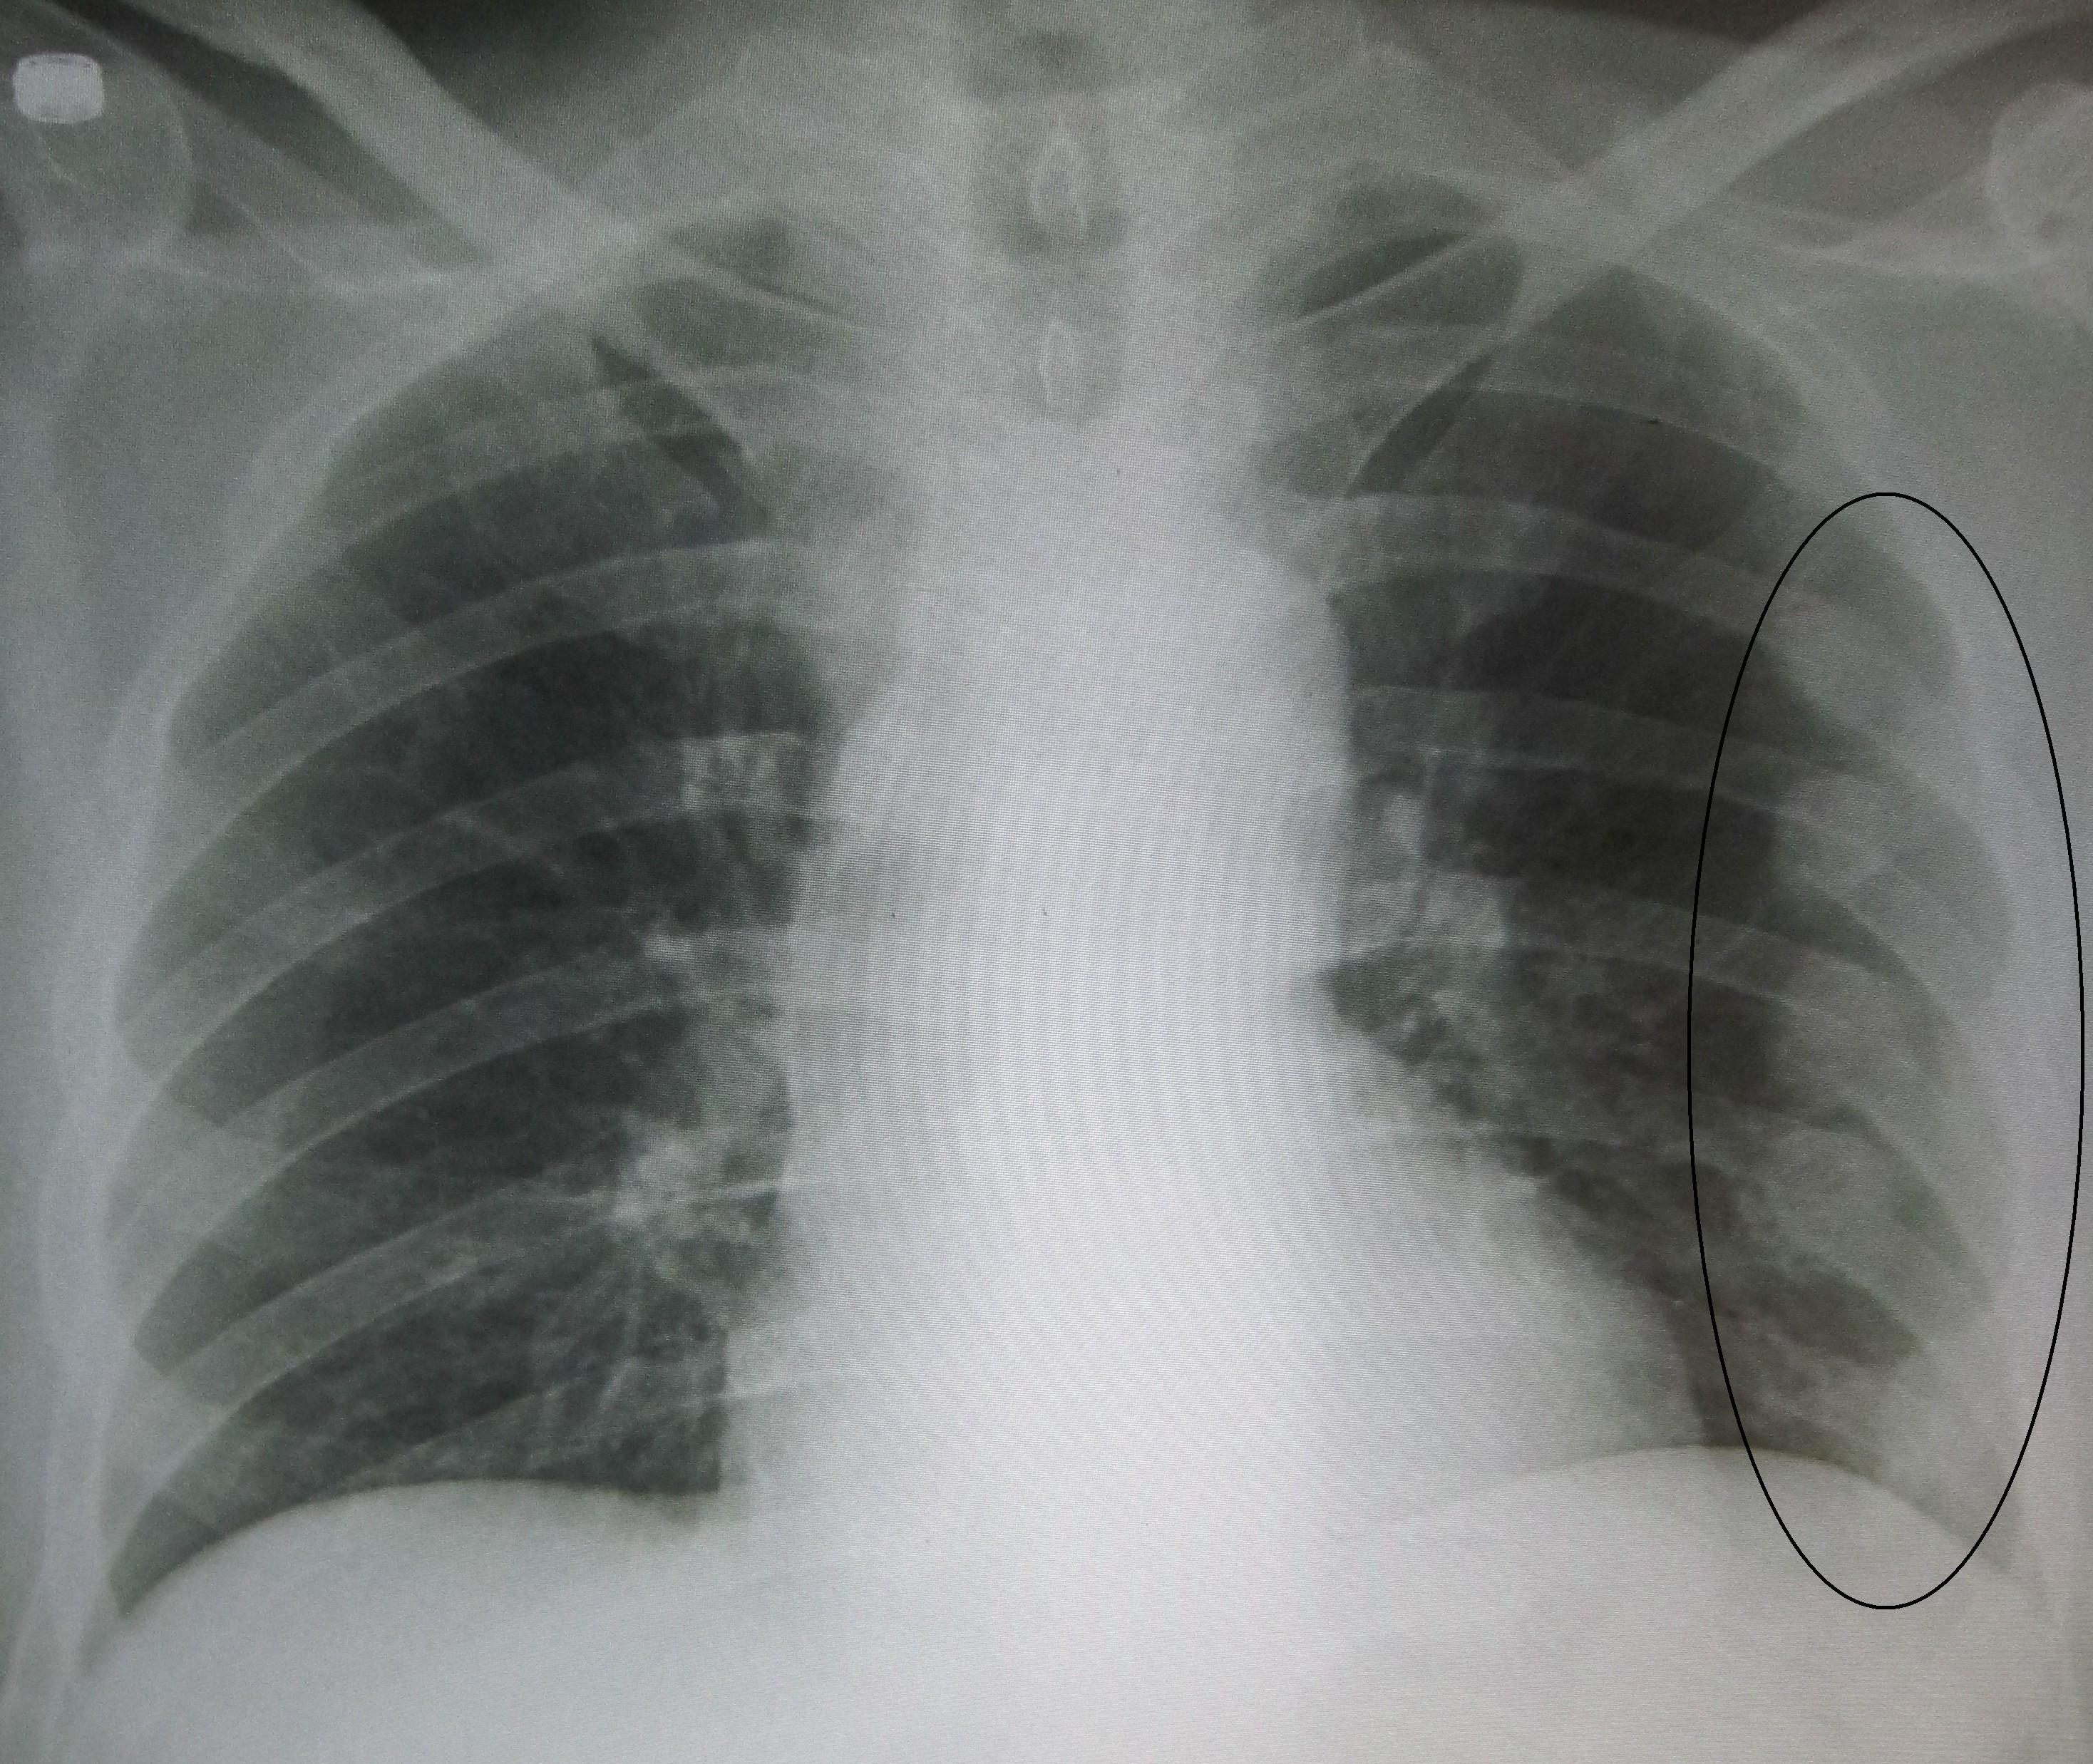 Broken Ribs X-rays